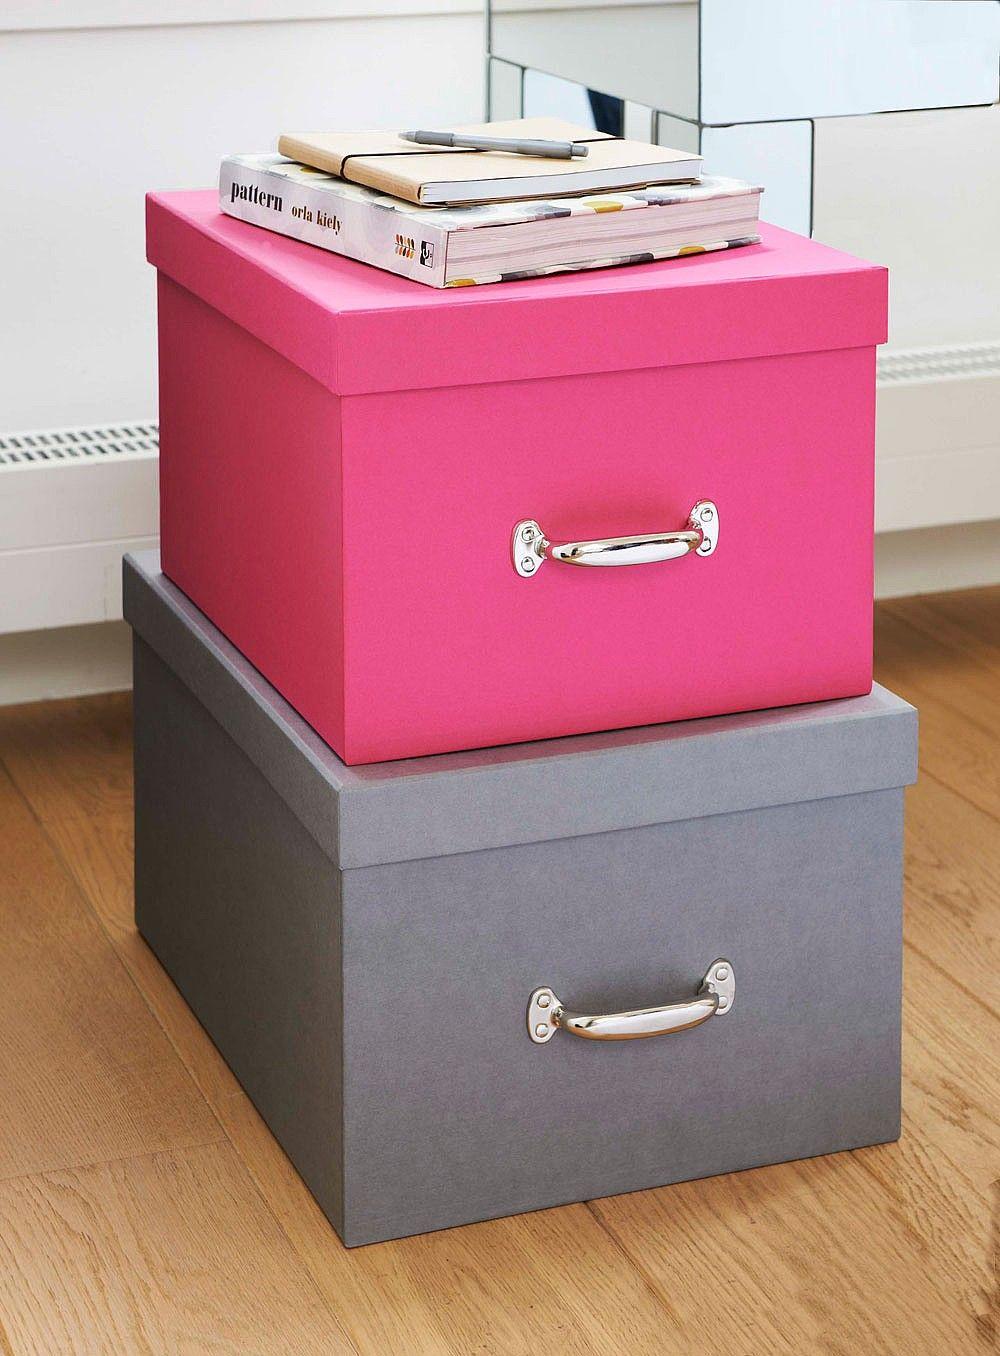 43+ Living room blanket storage basket with lid ideas in 2021